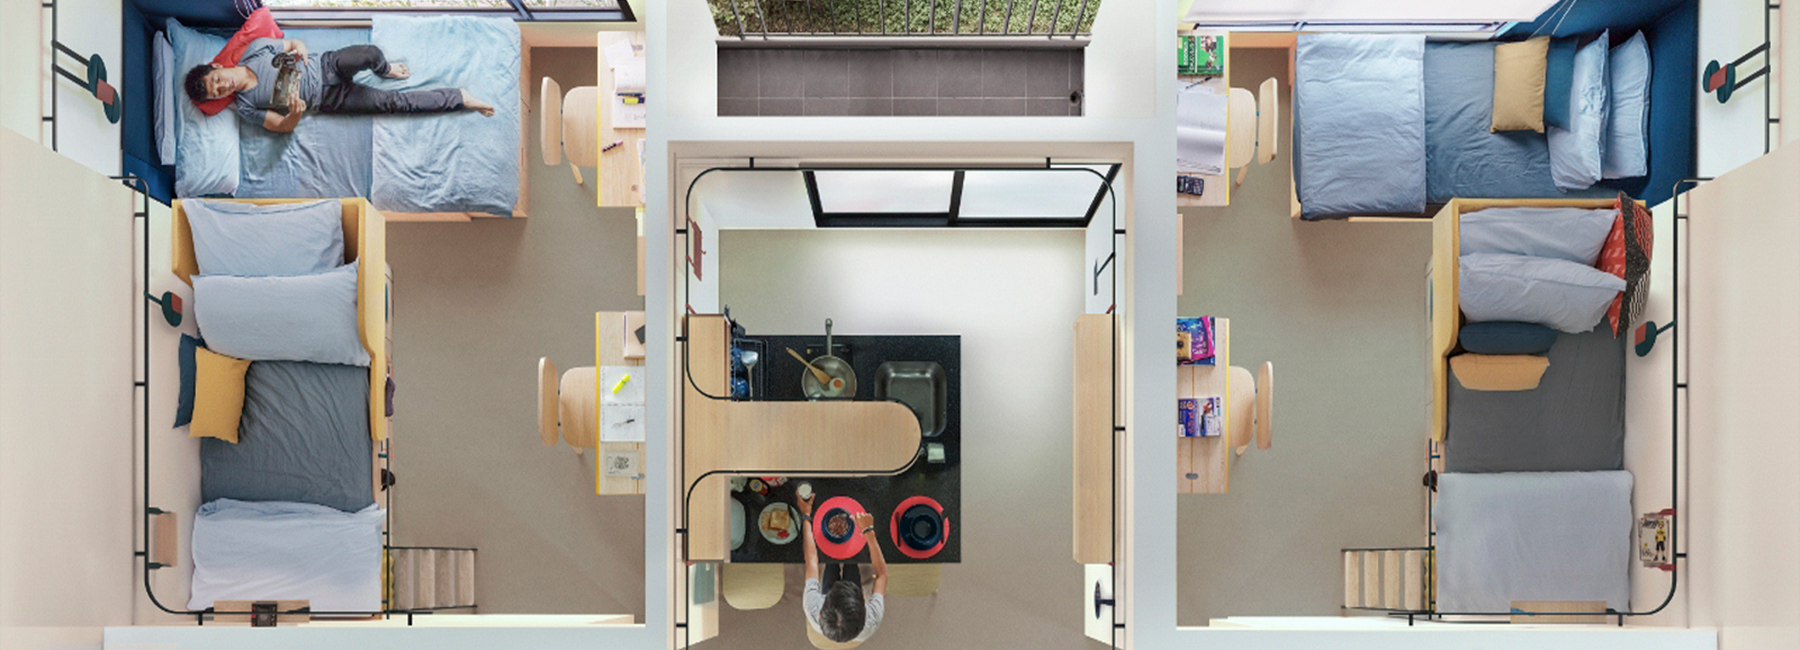 fabrica-coliving-bangkok-space-scholarship-designbom-1800.jpg